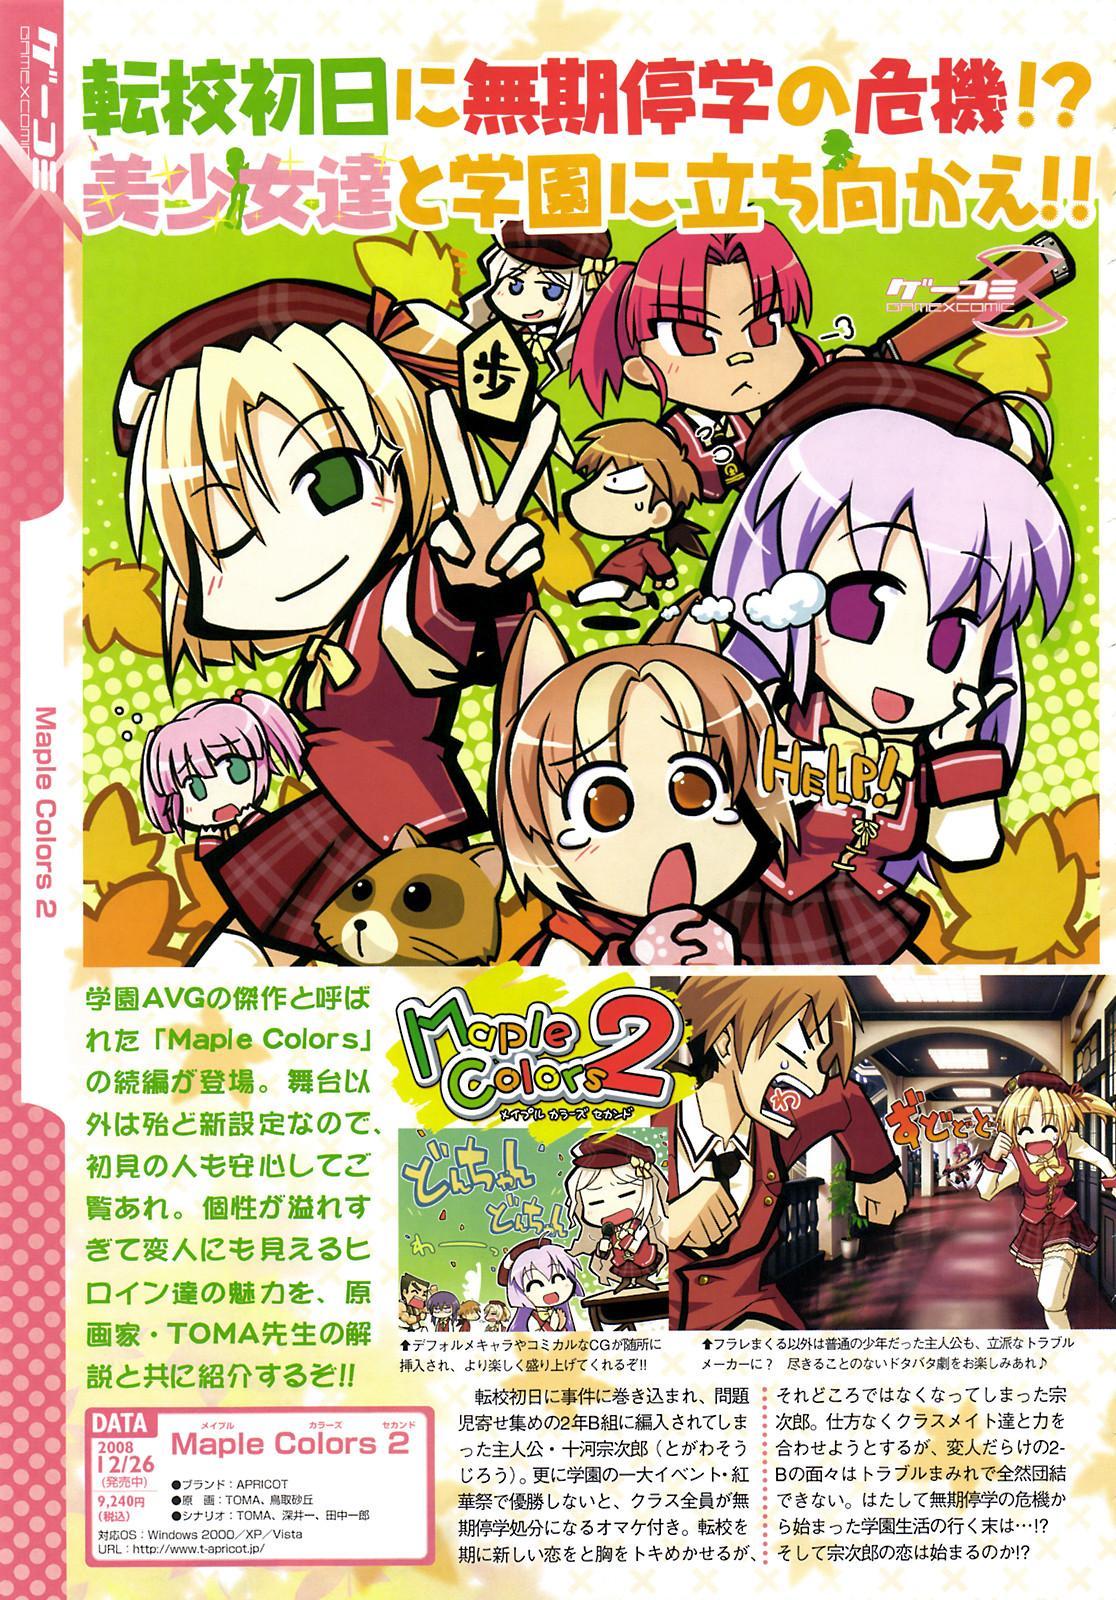 COMIC Megastore 2009-04 17